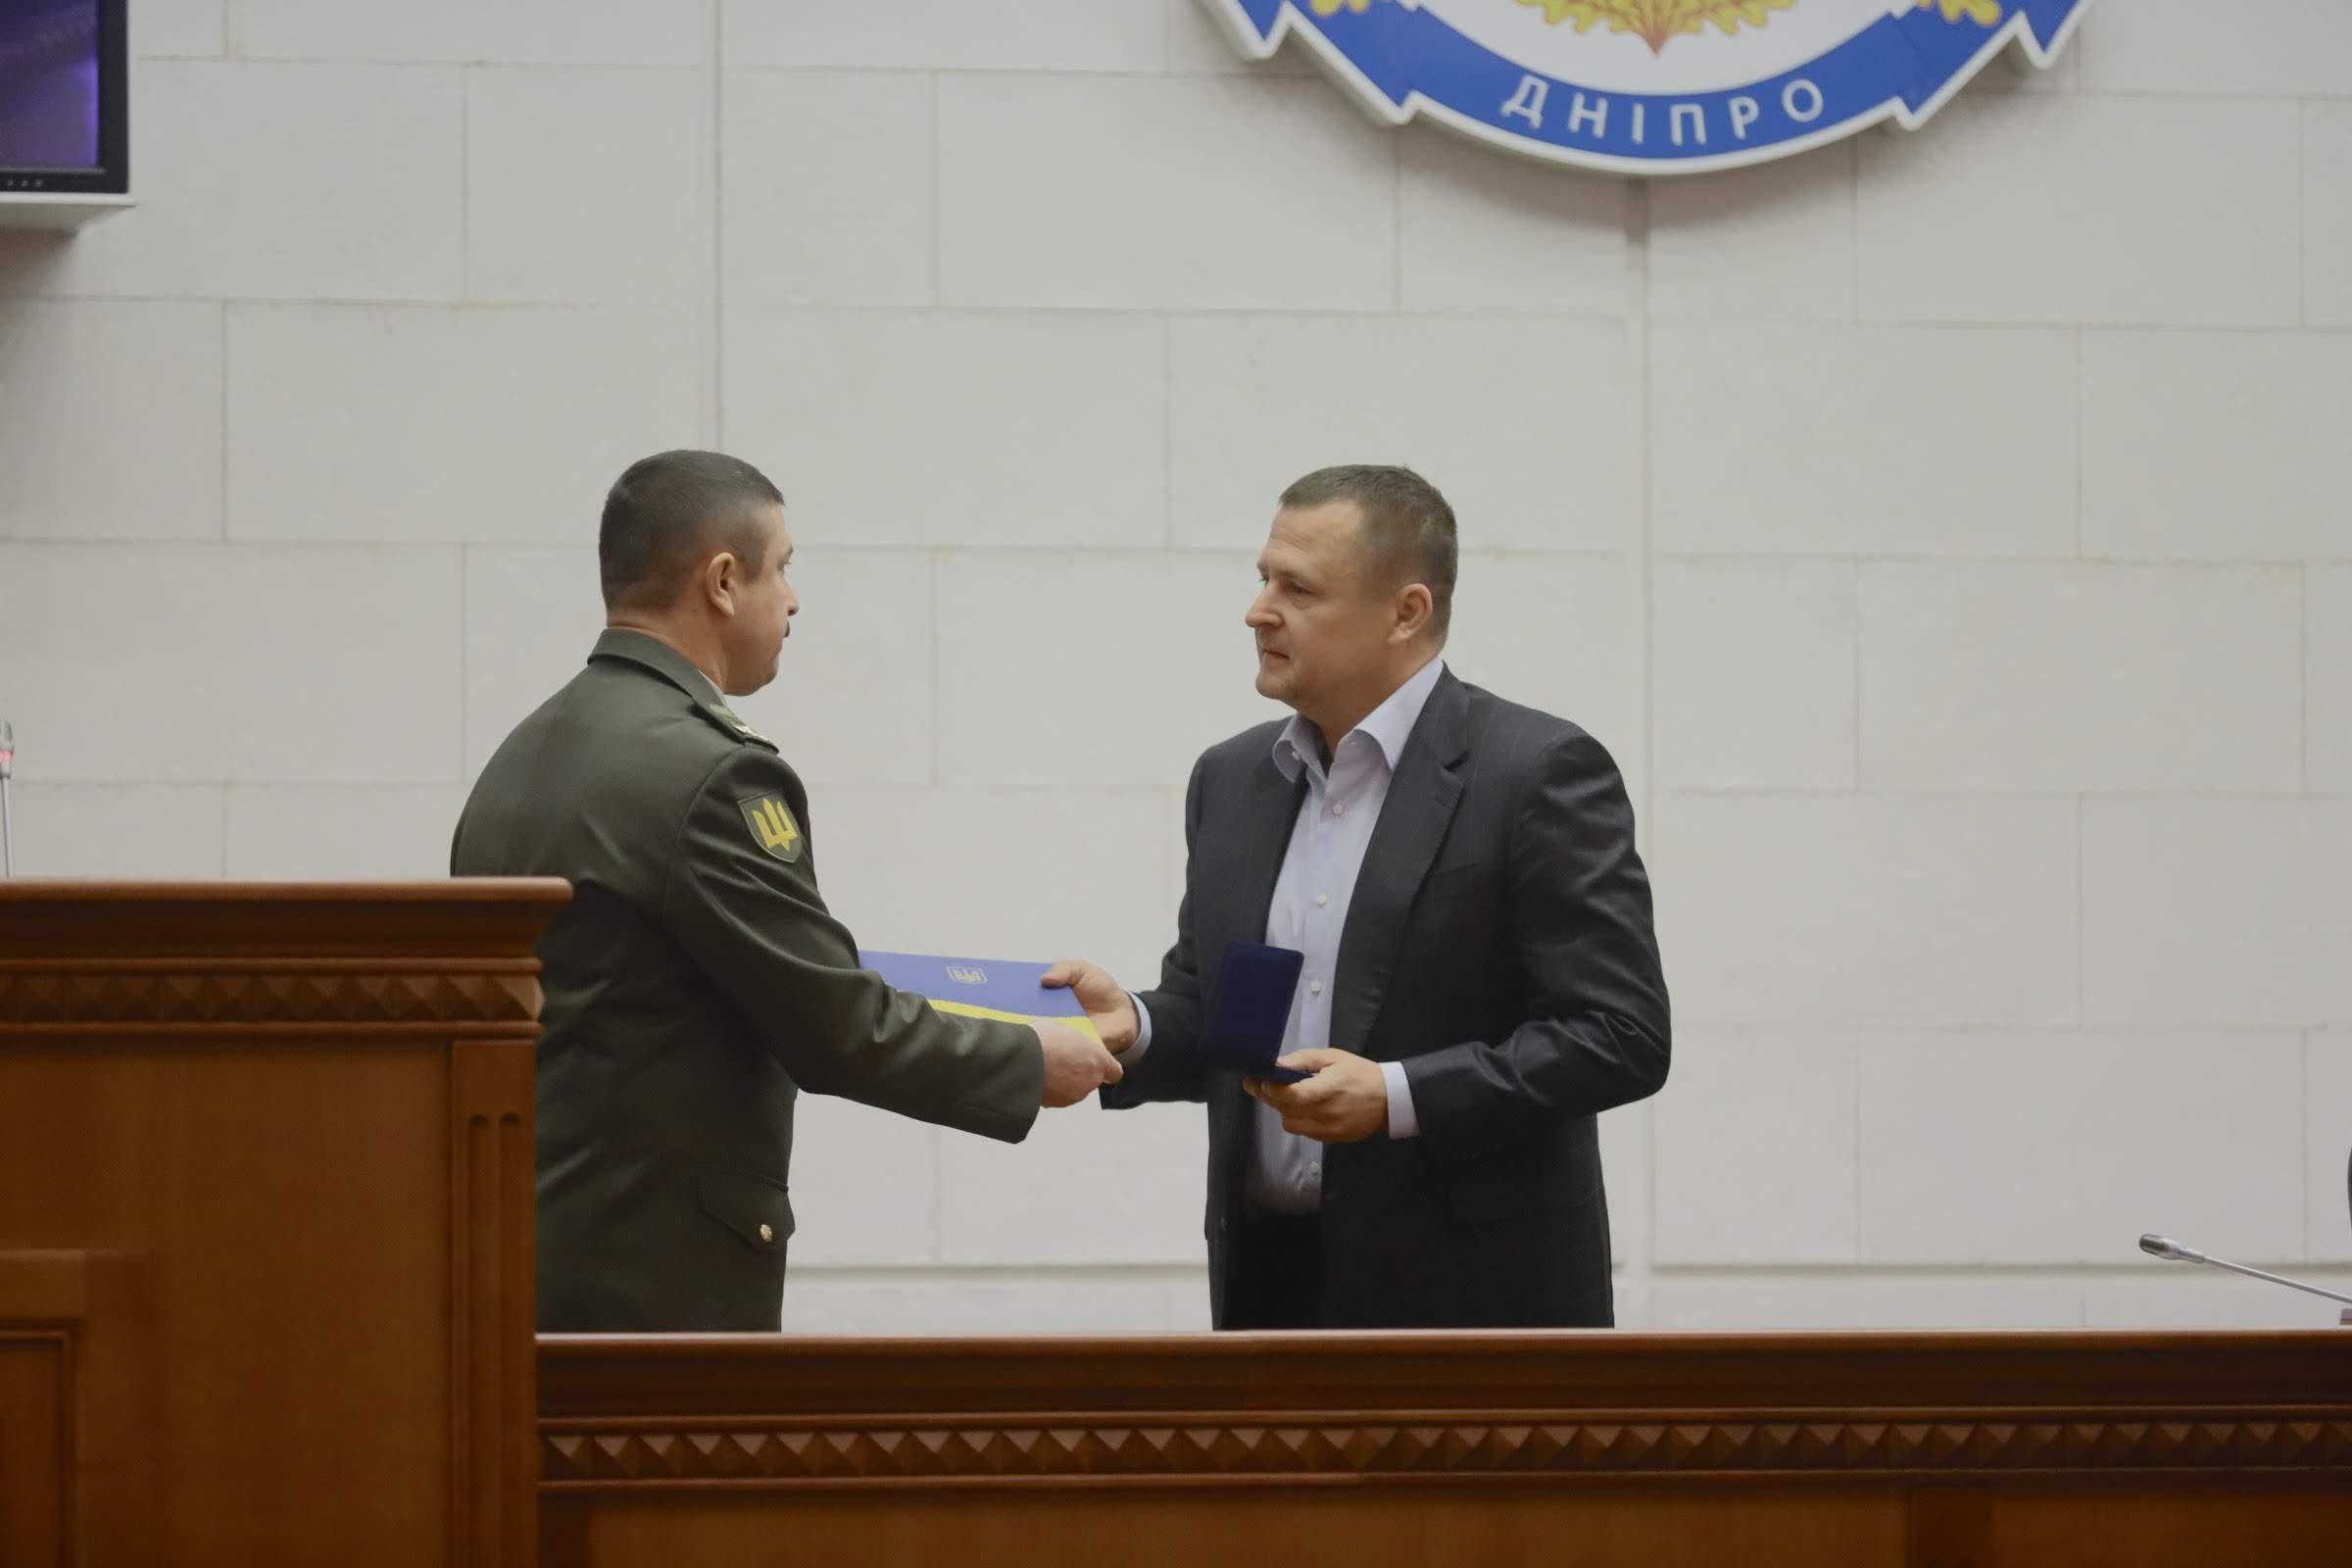 Бориса Филатова наградили на сессии горсовета. Новости Днепра